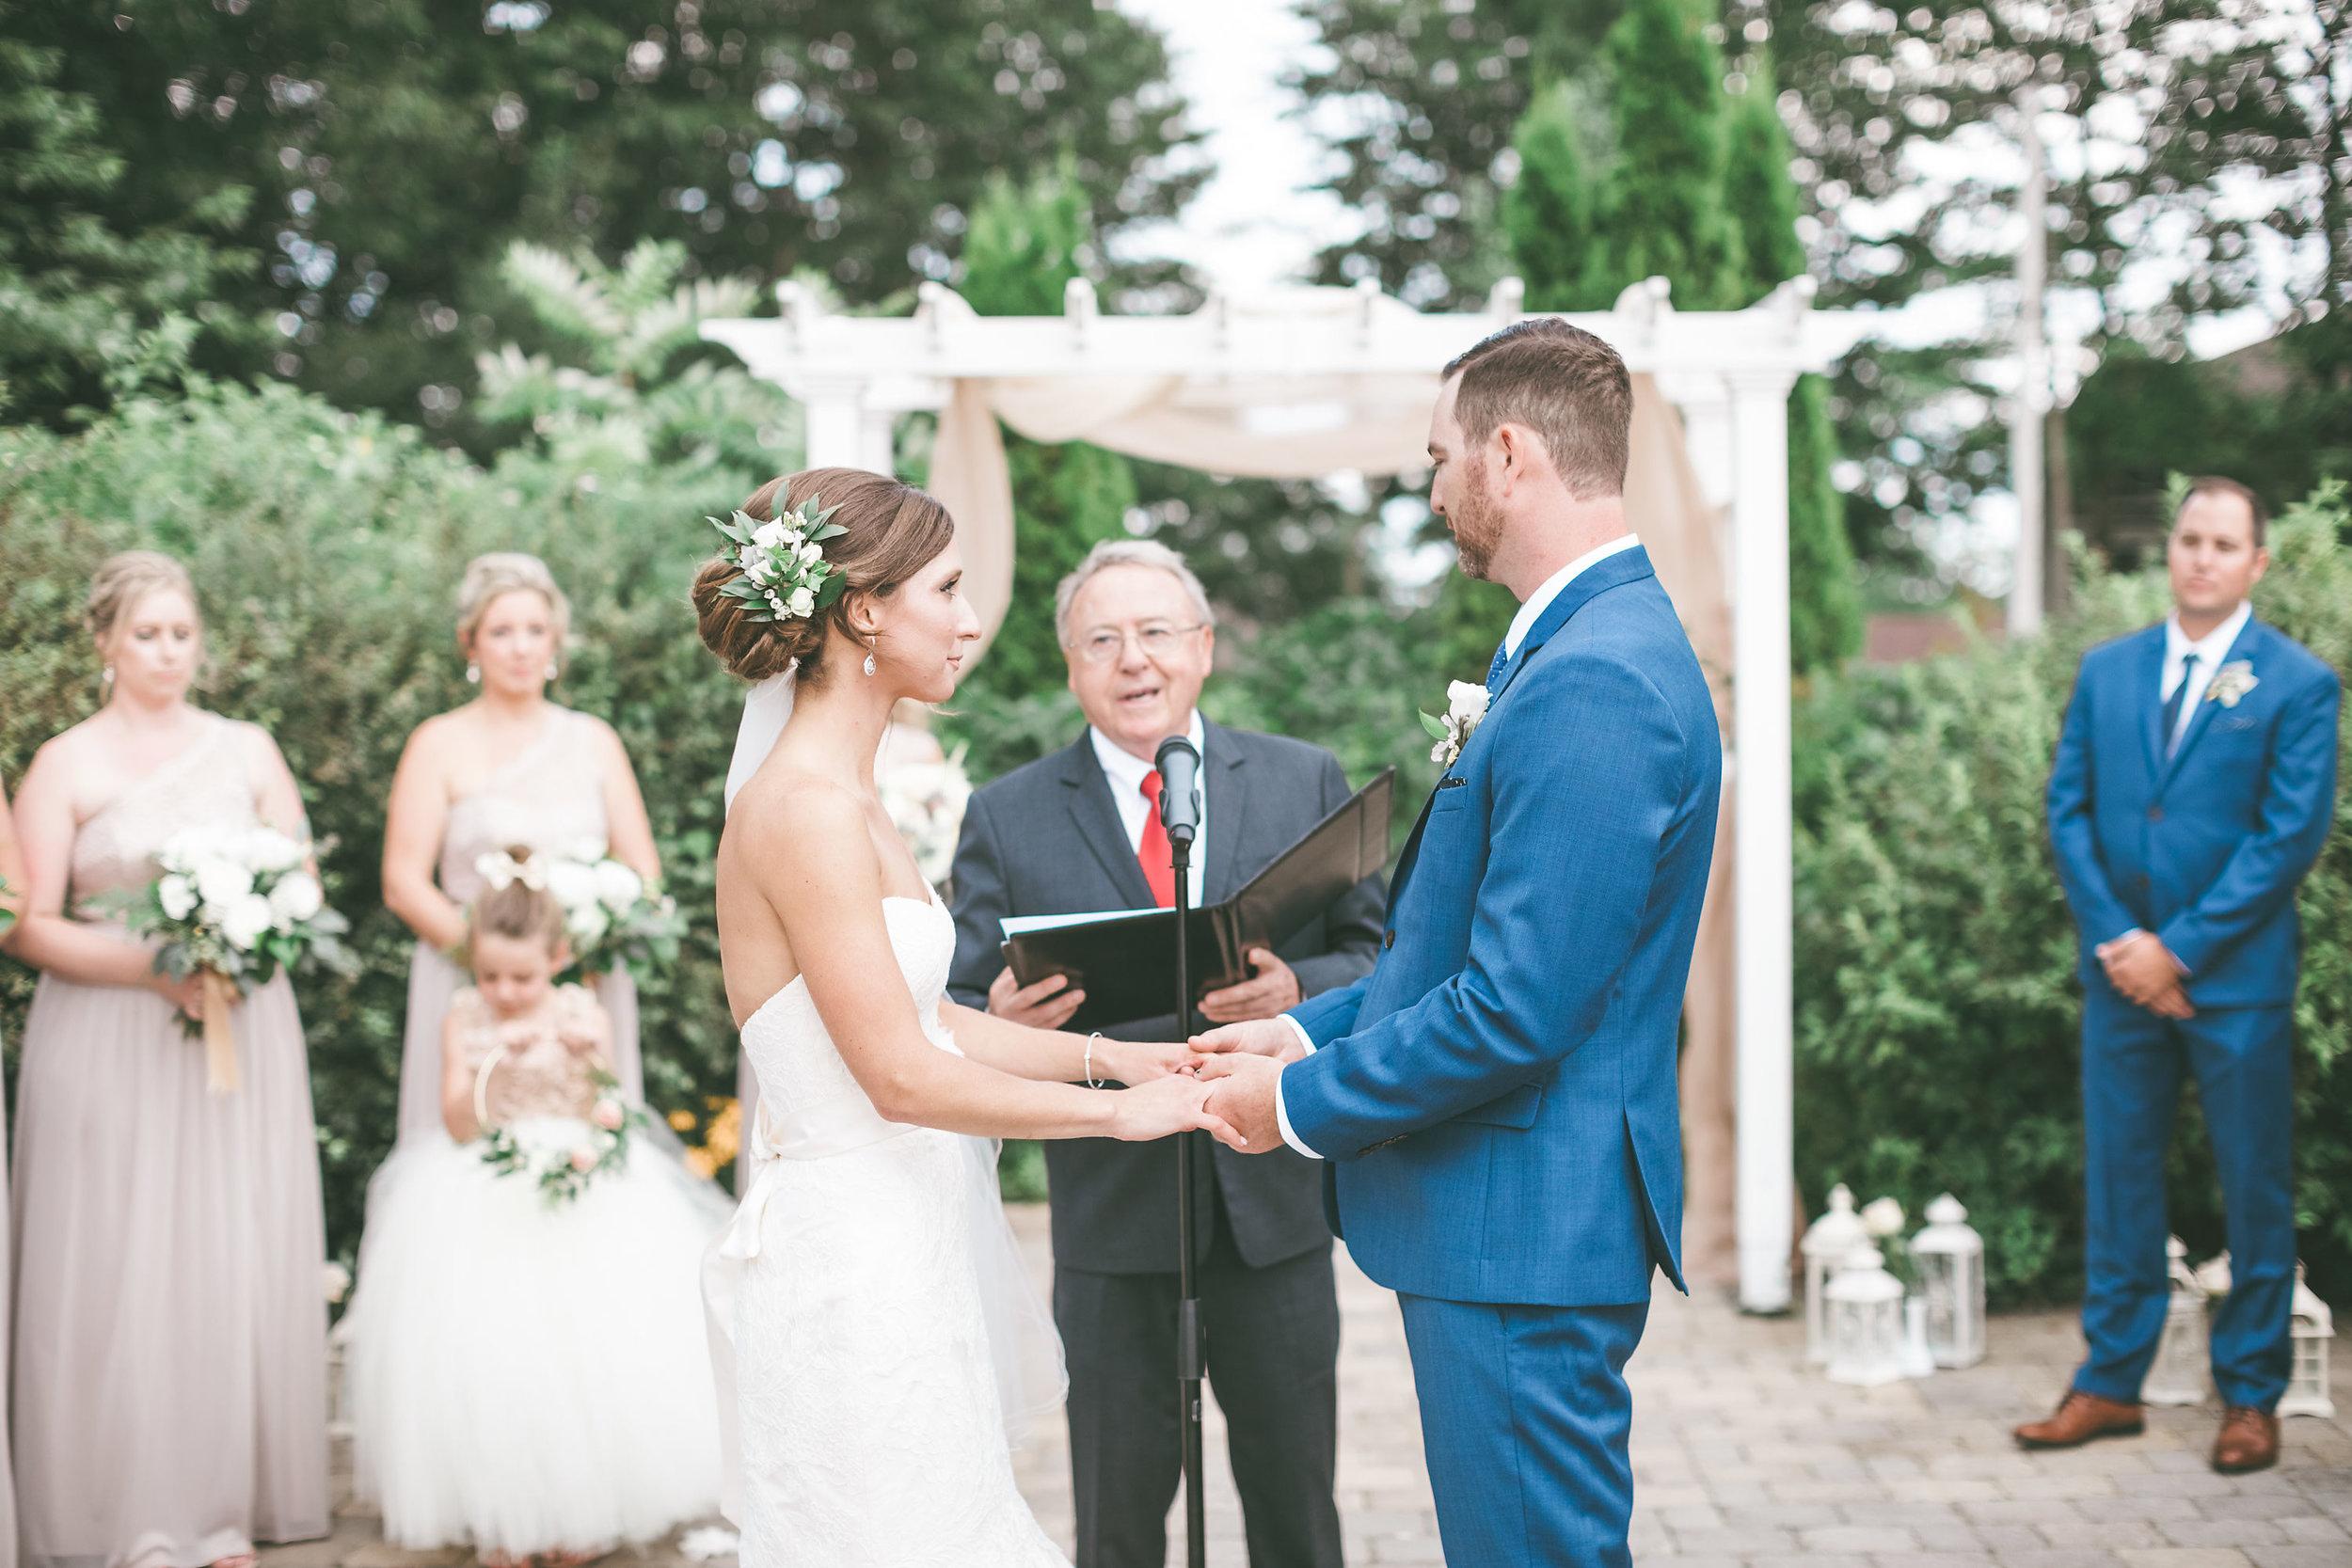 meaghan___darryl_wedding___danielcarusophotography___0793.jpg